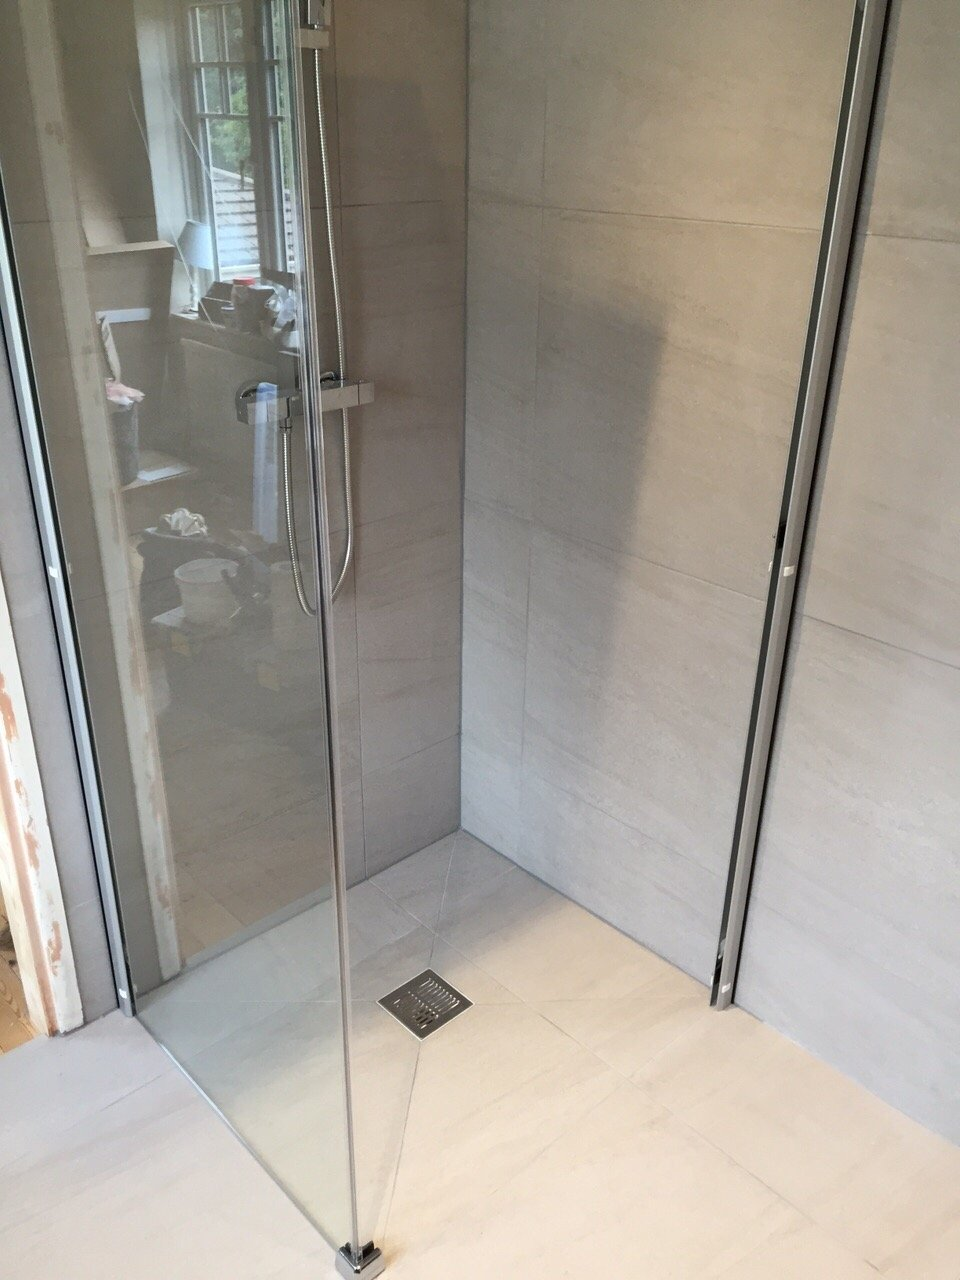 Lill bathroom